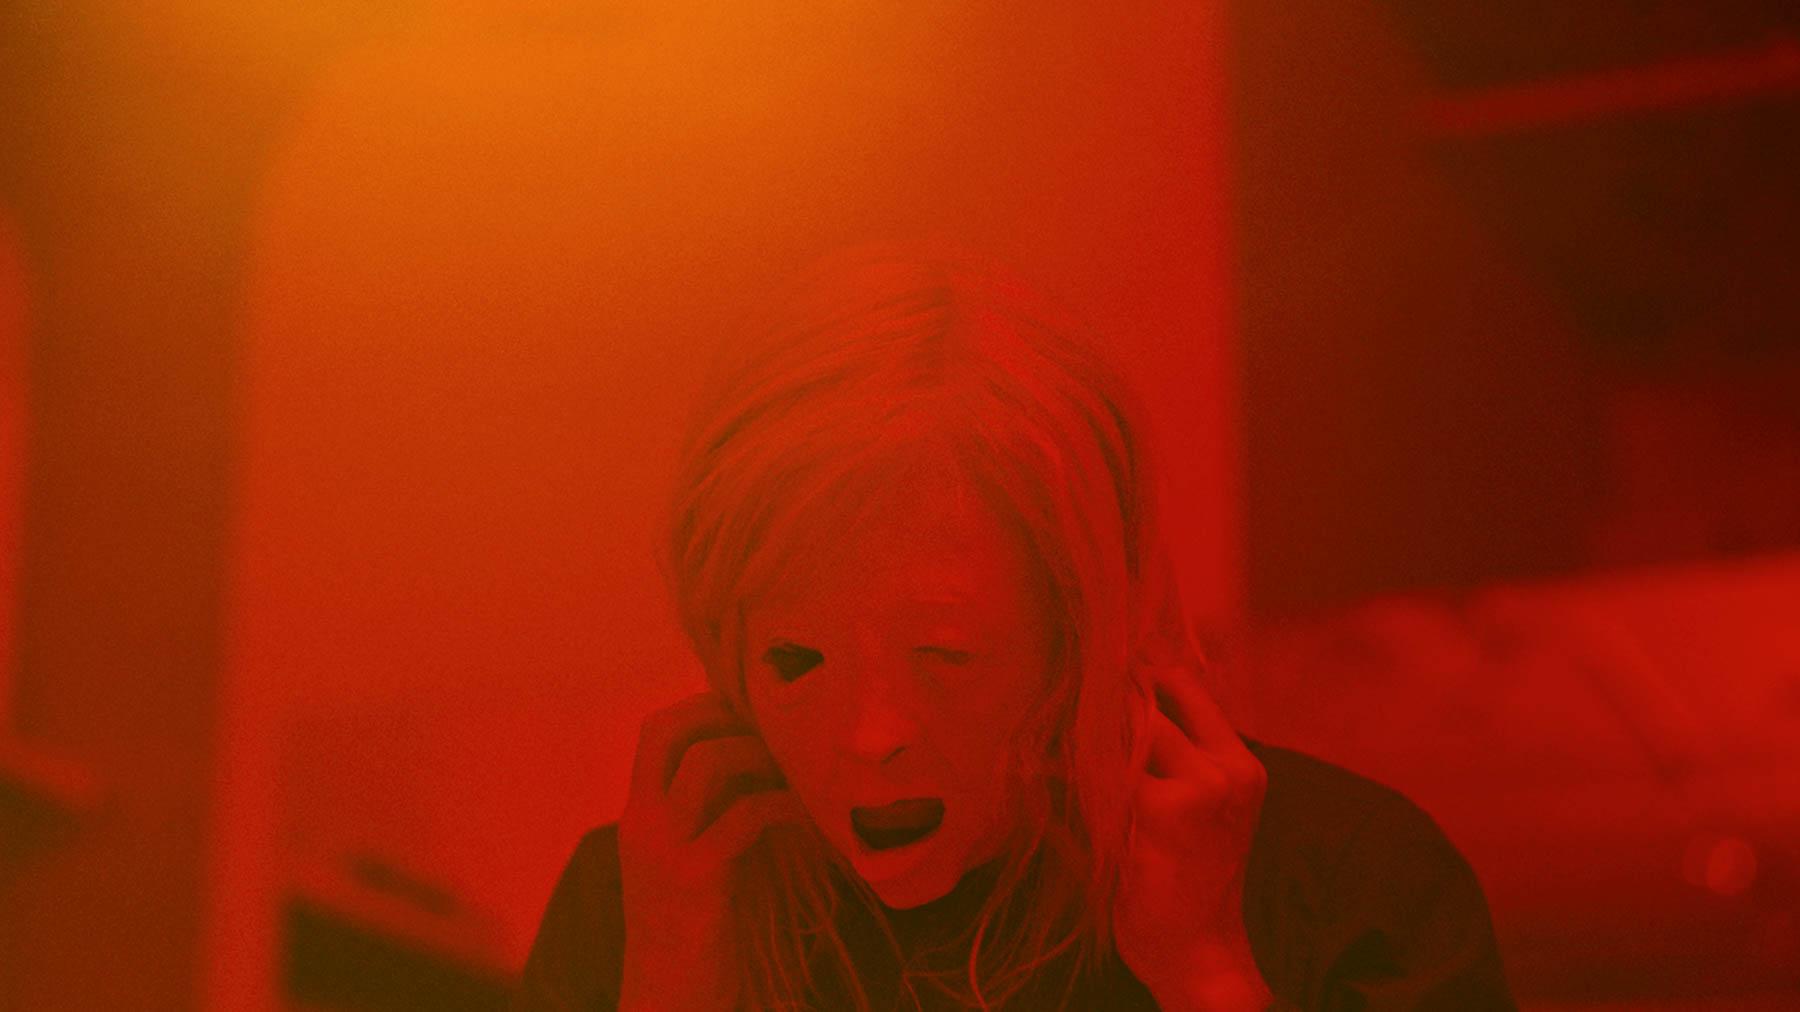 Possessor - a female assassin in a man's body? Cronenberg's sci-fi horror!